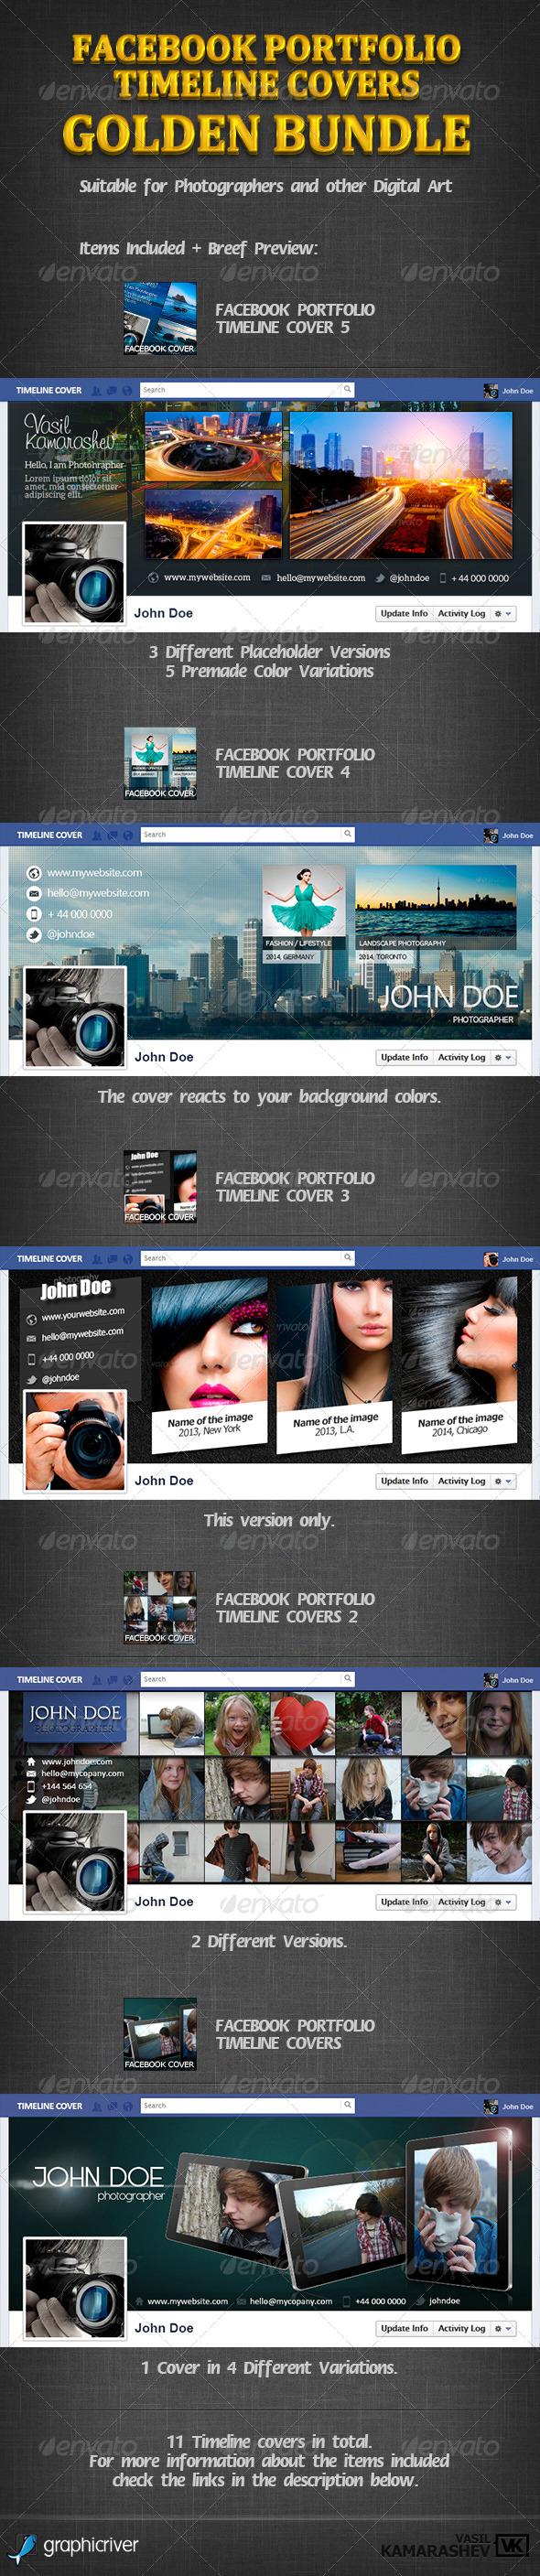 GraphicRiver Facebook Portfolio Timeline Covers Golden Bundle 6862745